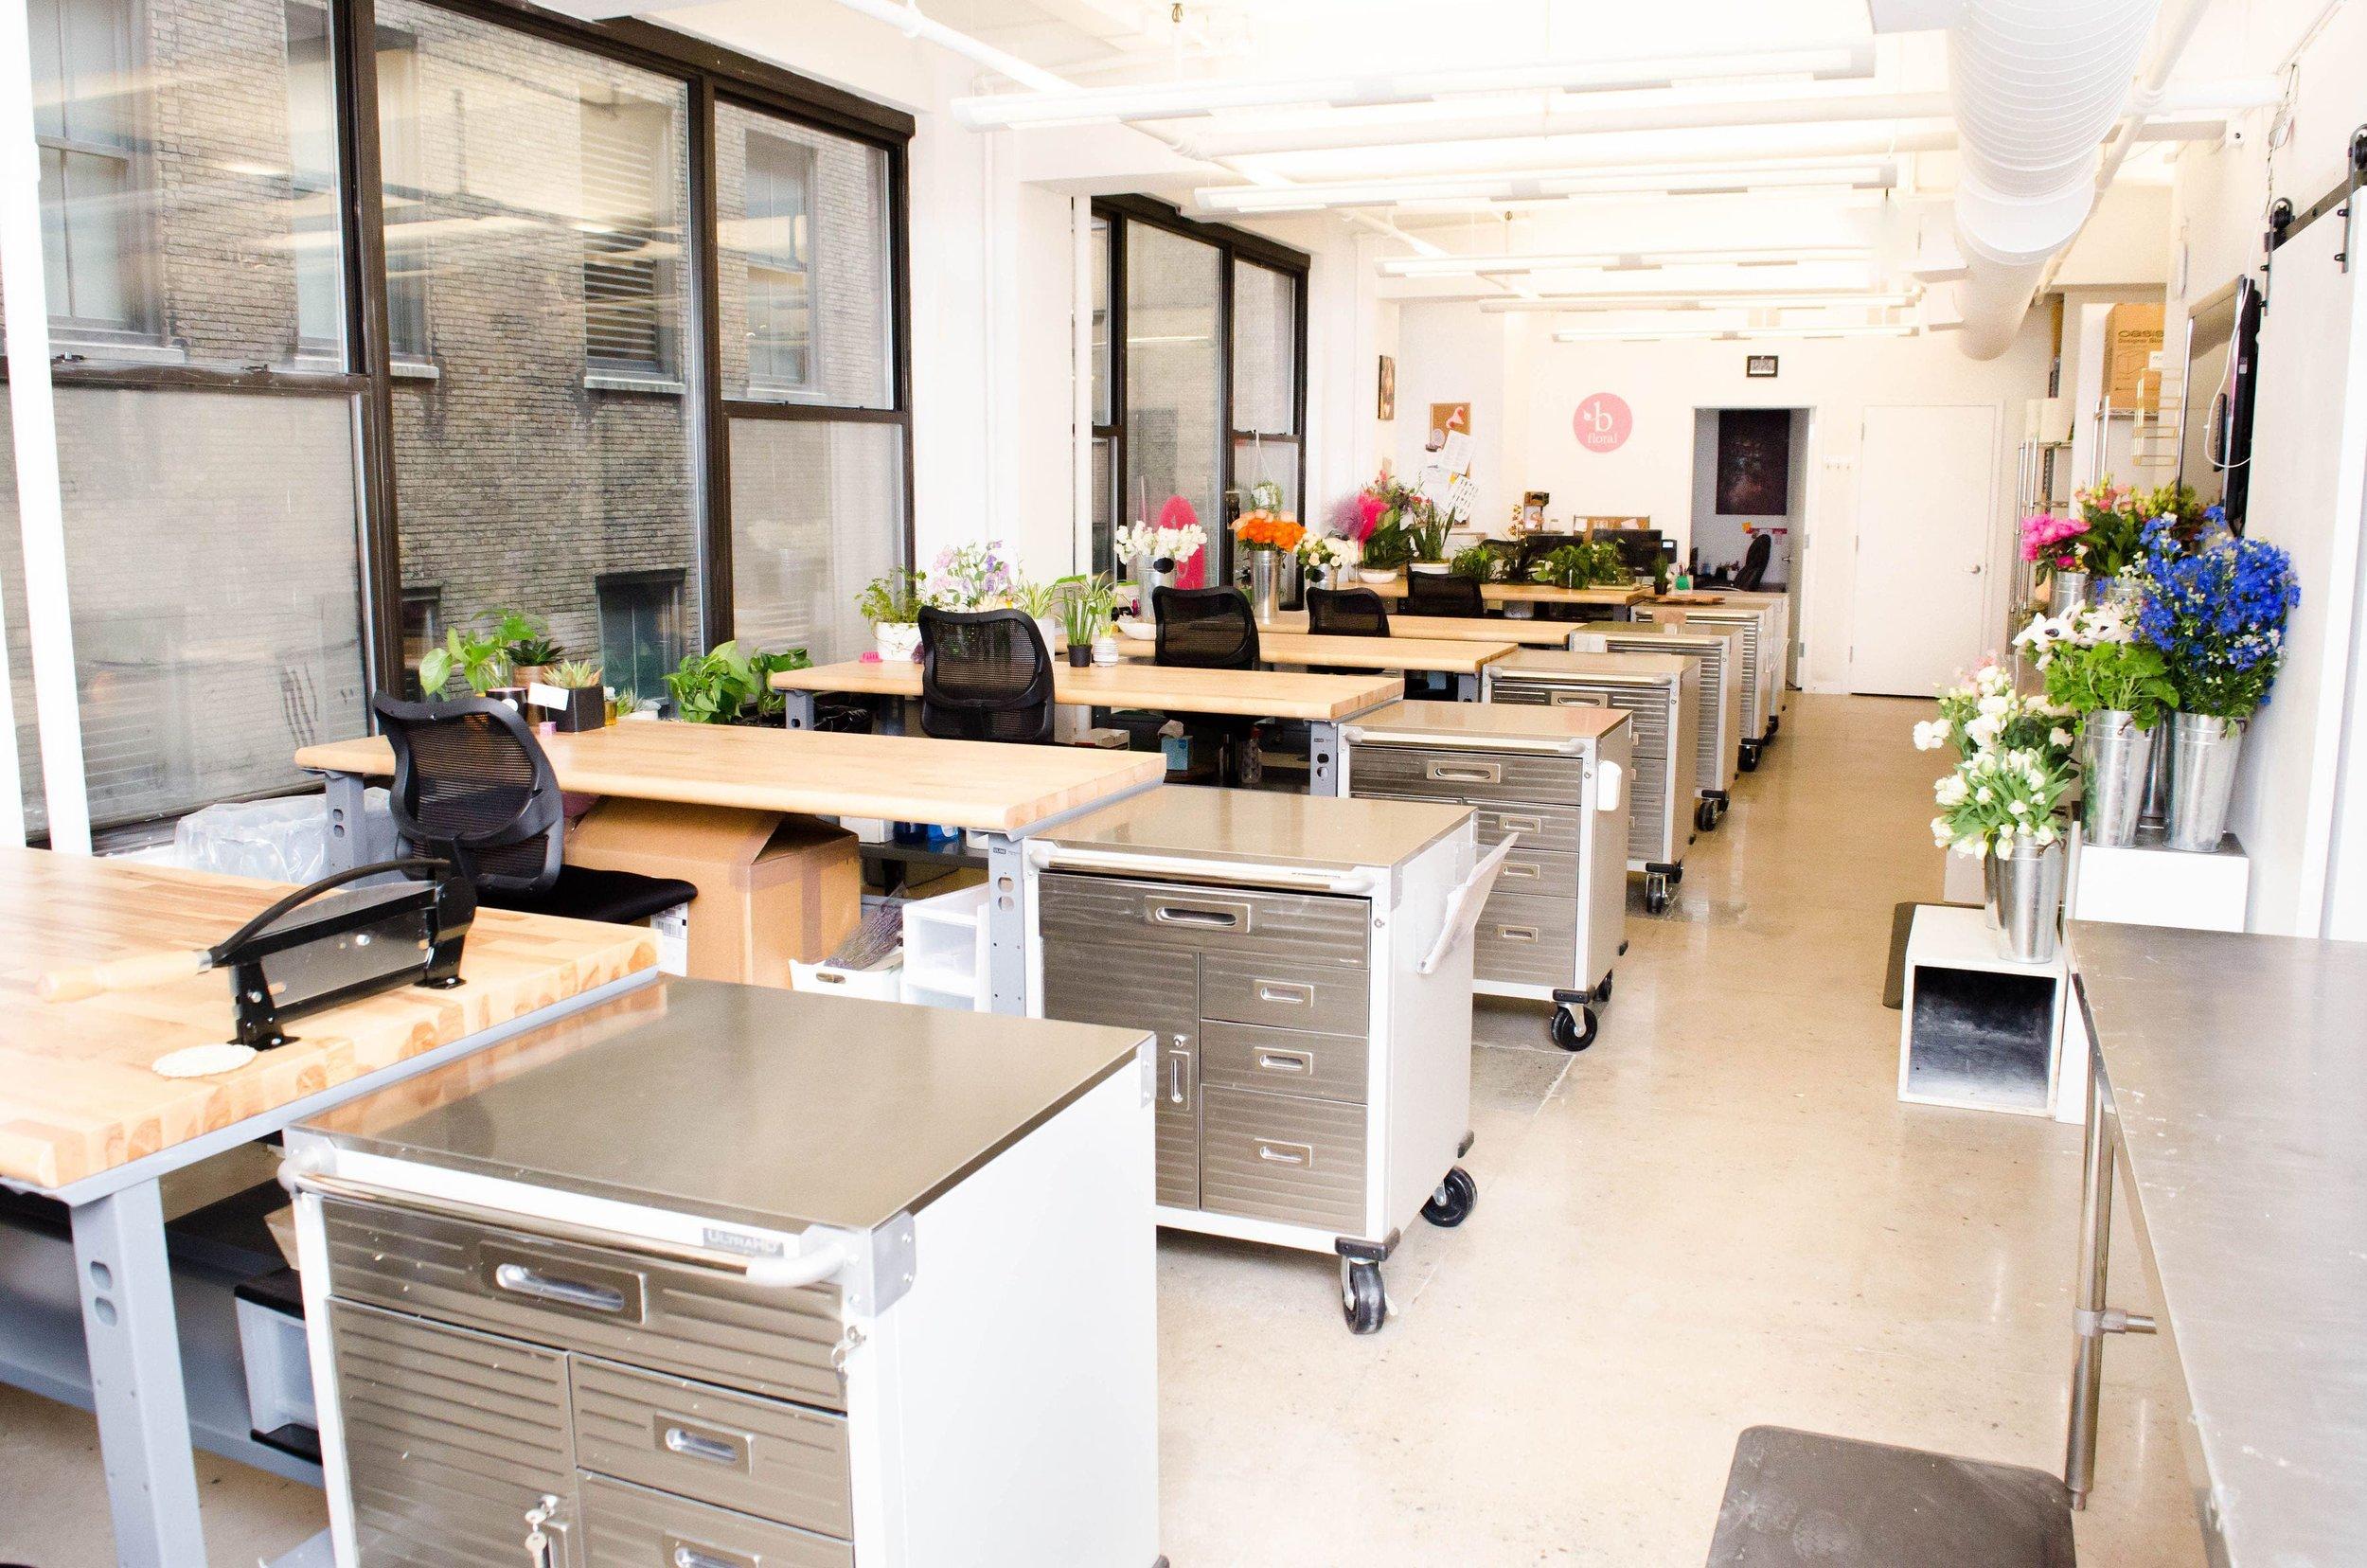 NEW - OFFICE - SPACE - MANHATTAN - COOL - OPEN - DESIGN - STUDIO - B FLORAL